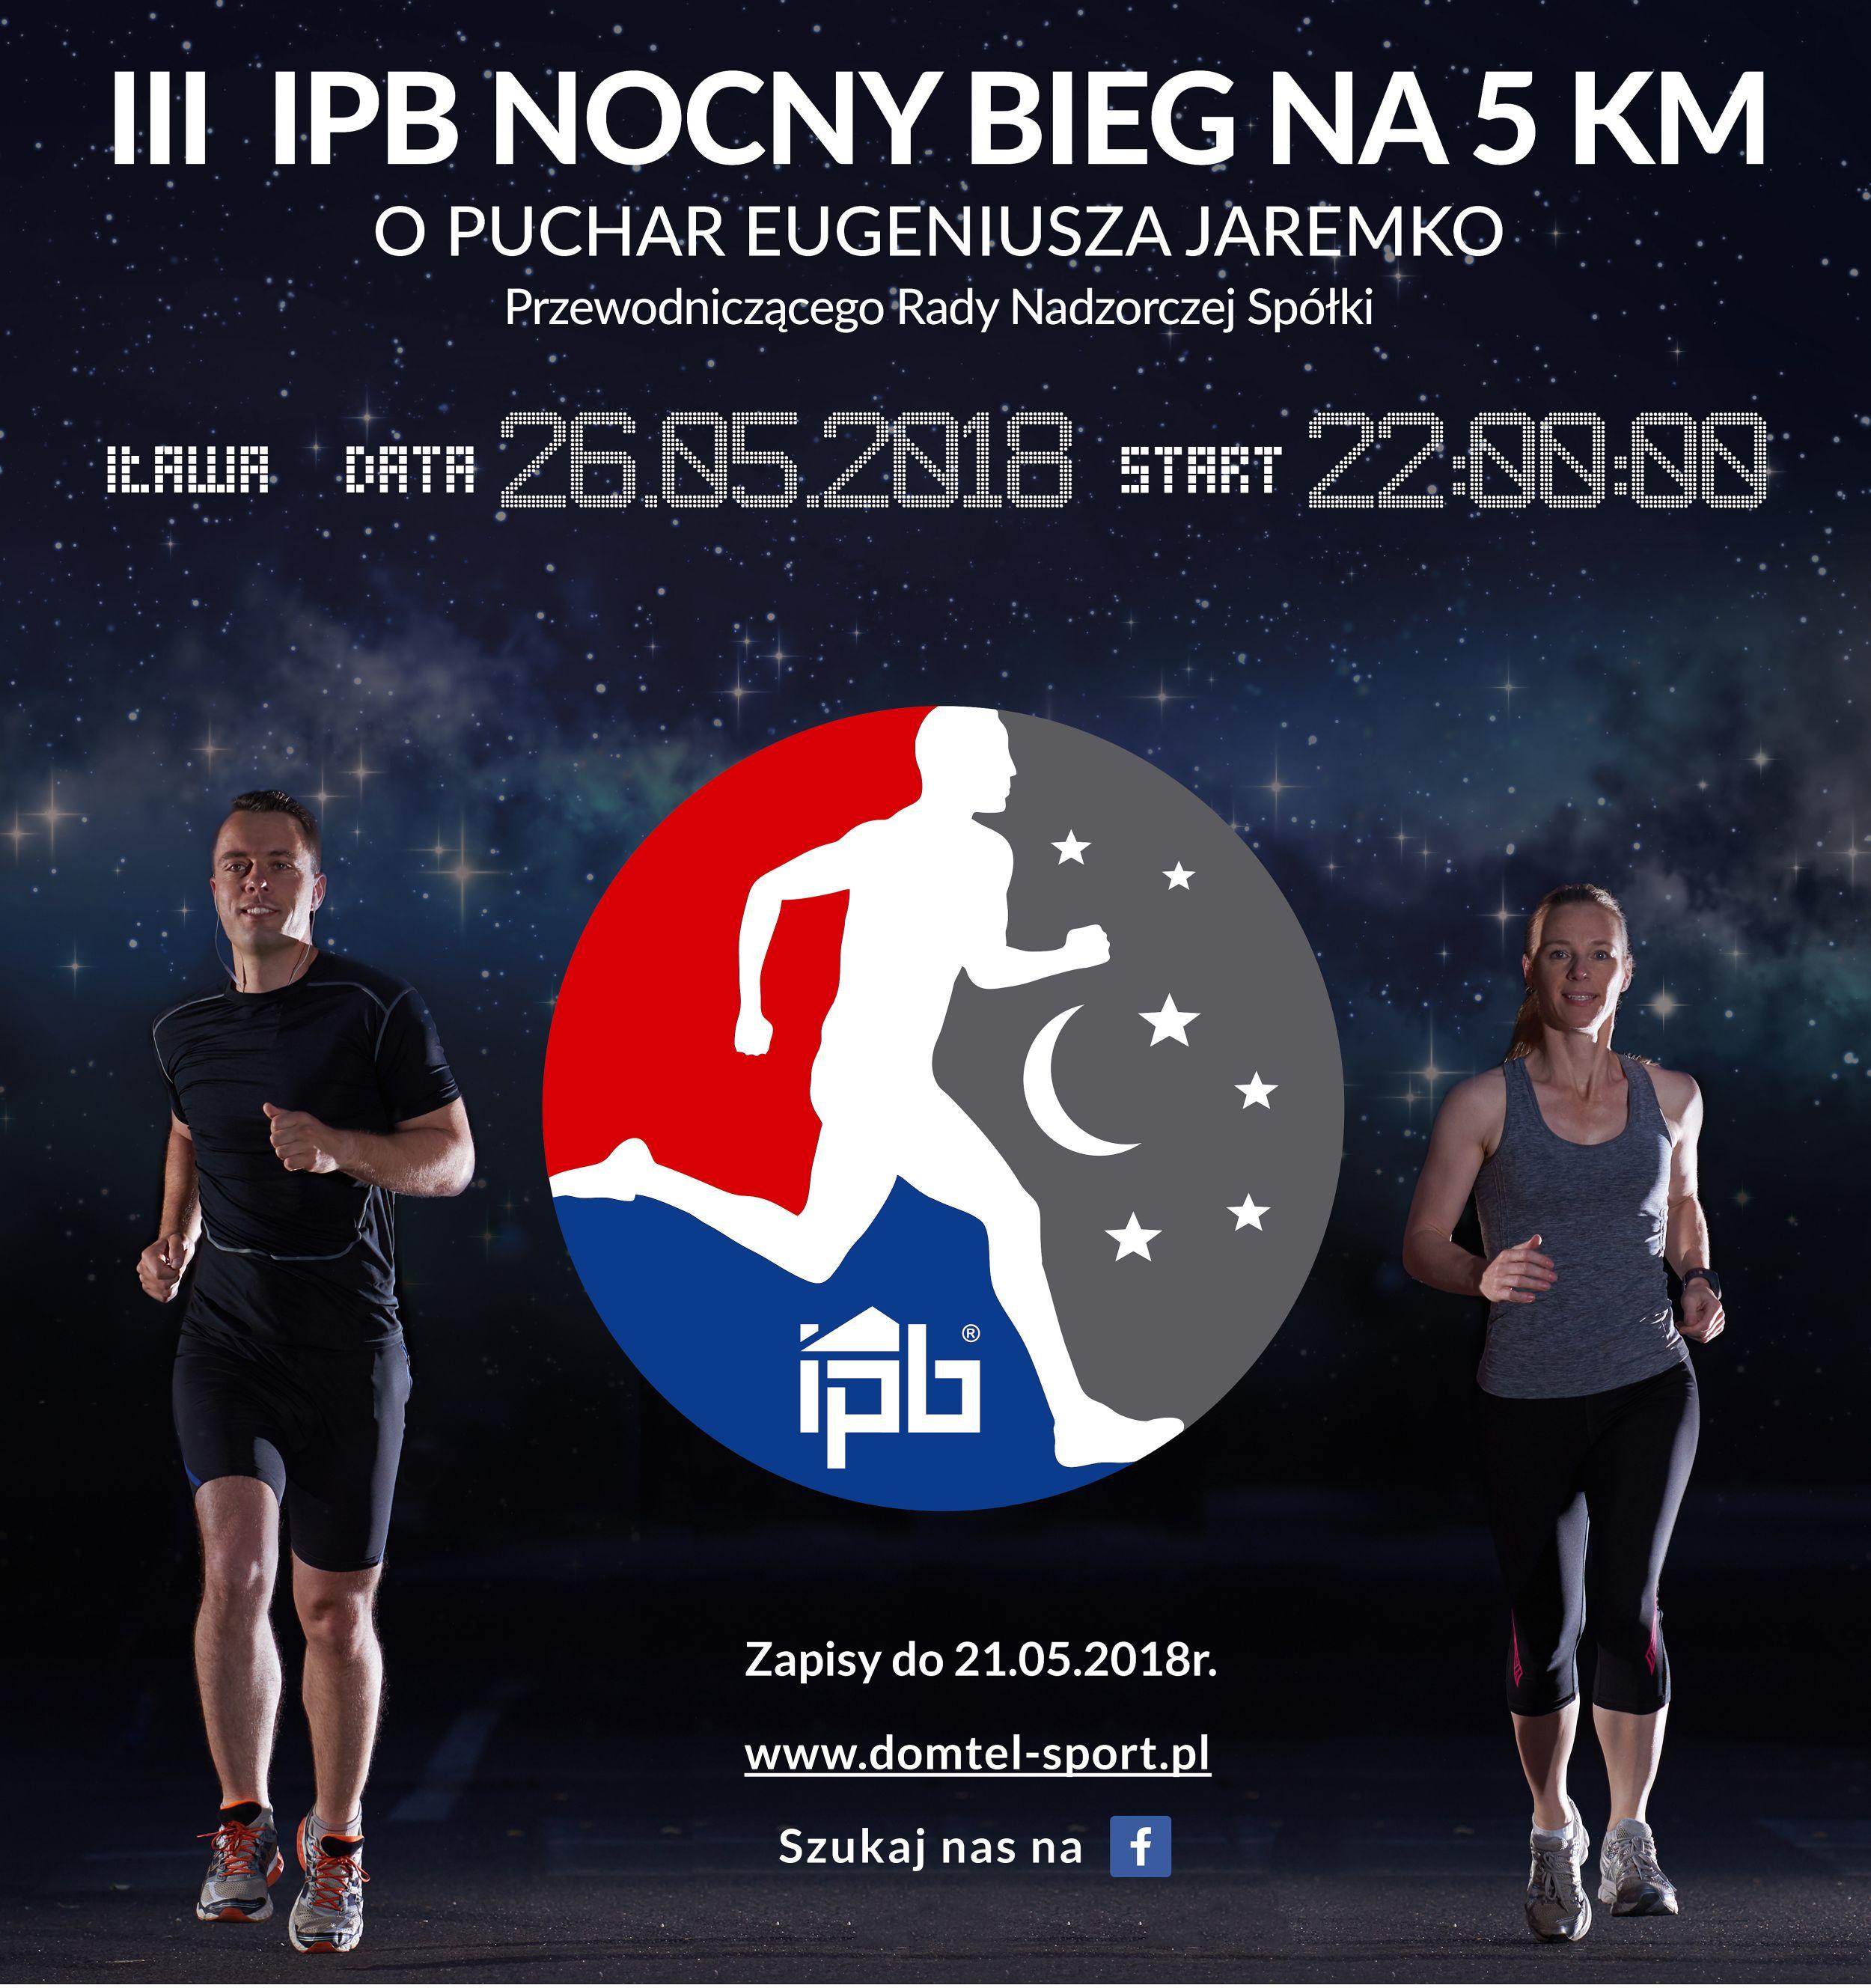 III IPB Nocny Bieg Na 5 km o Puchar Eugeniusza Jaremko